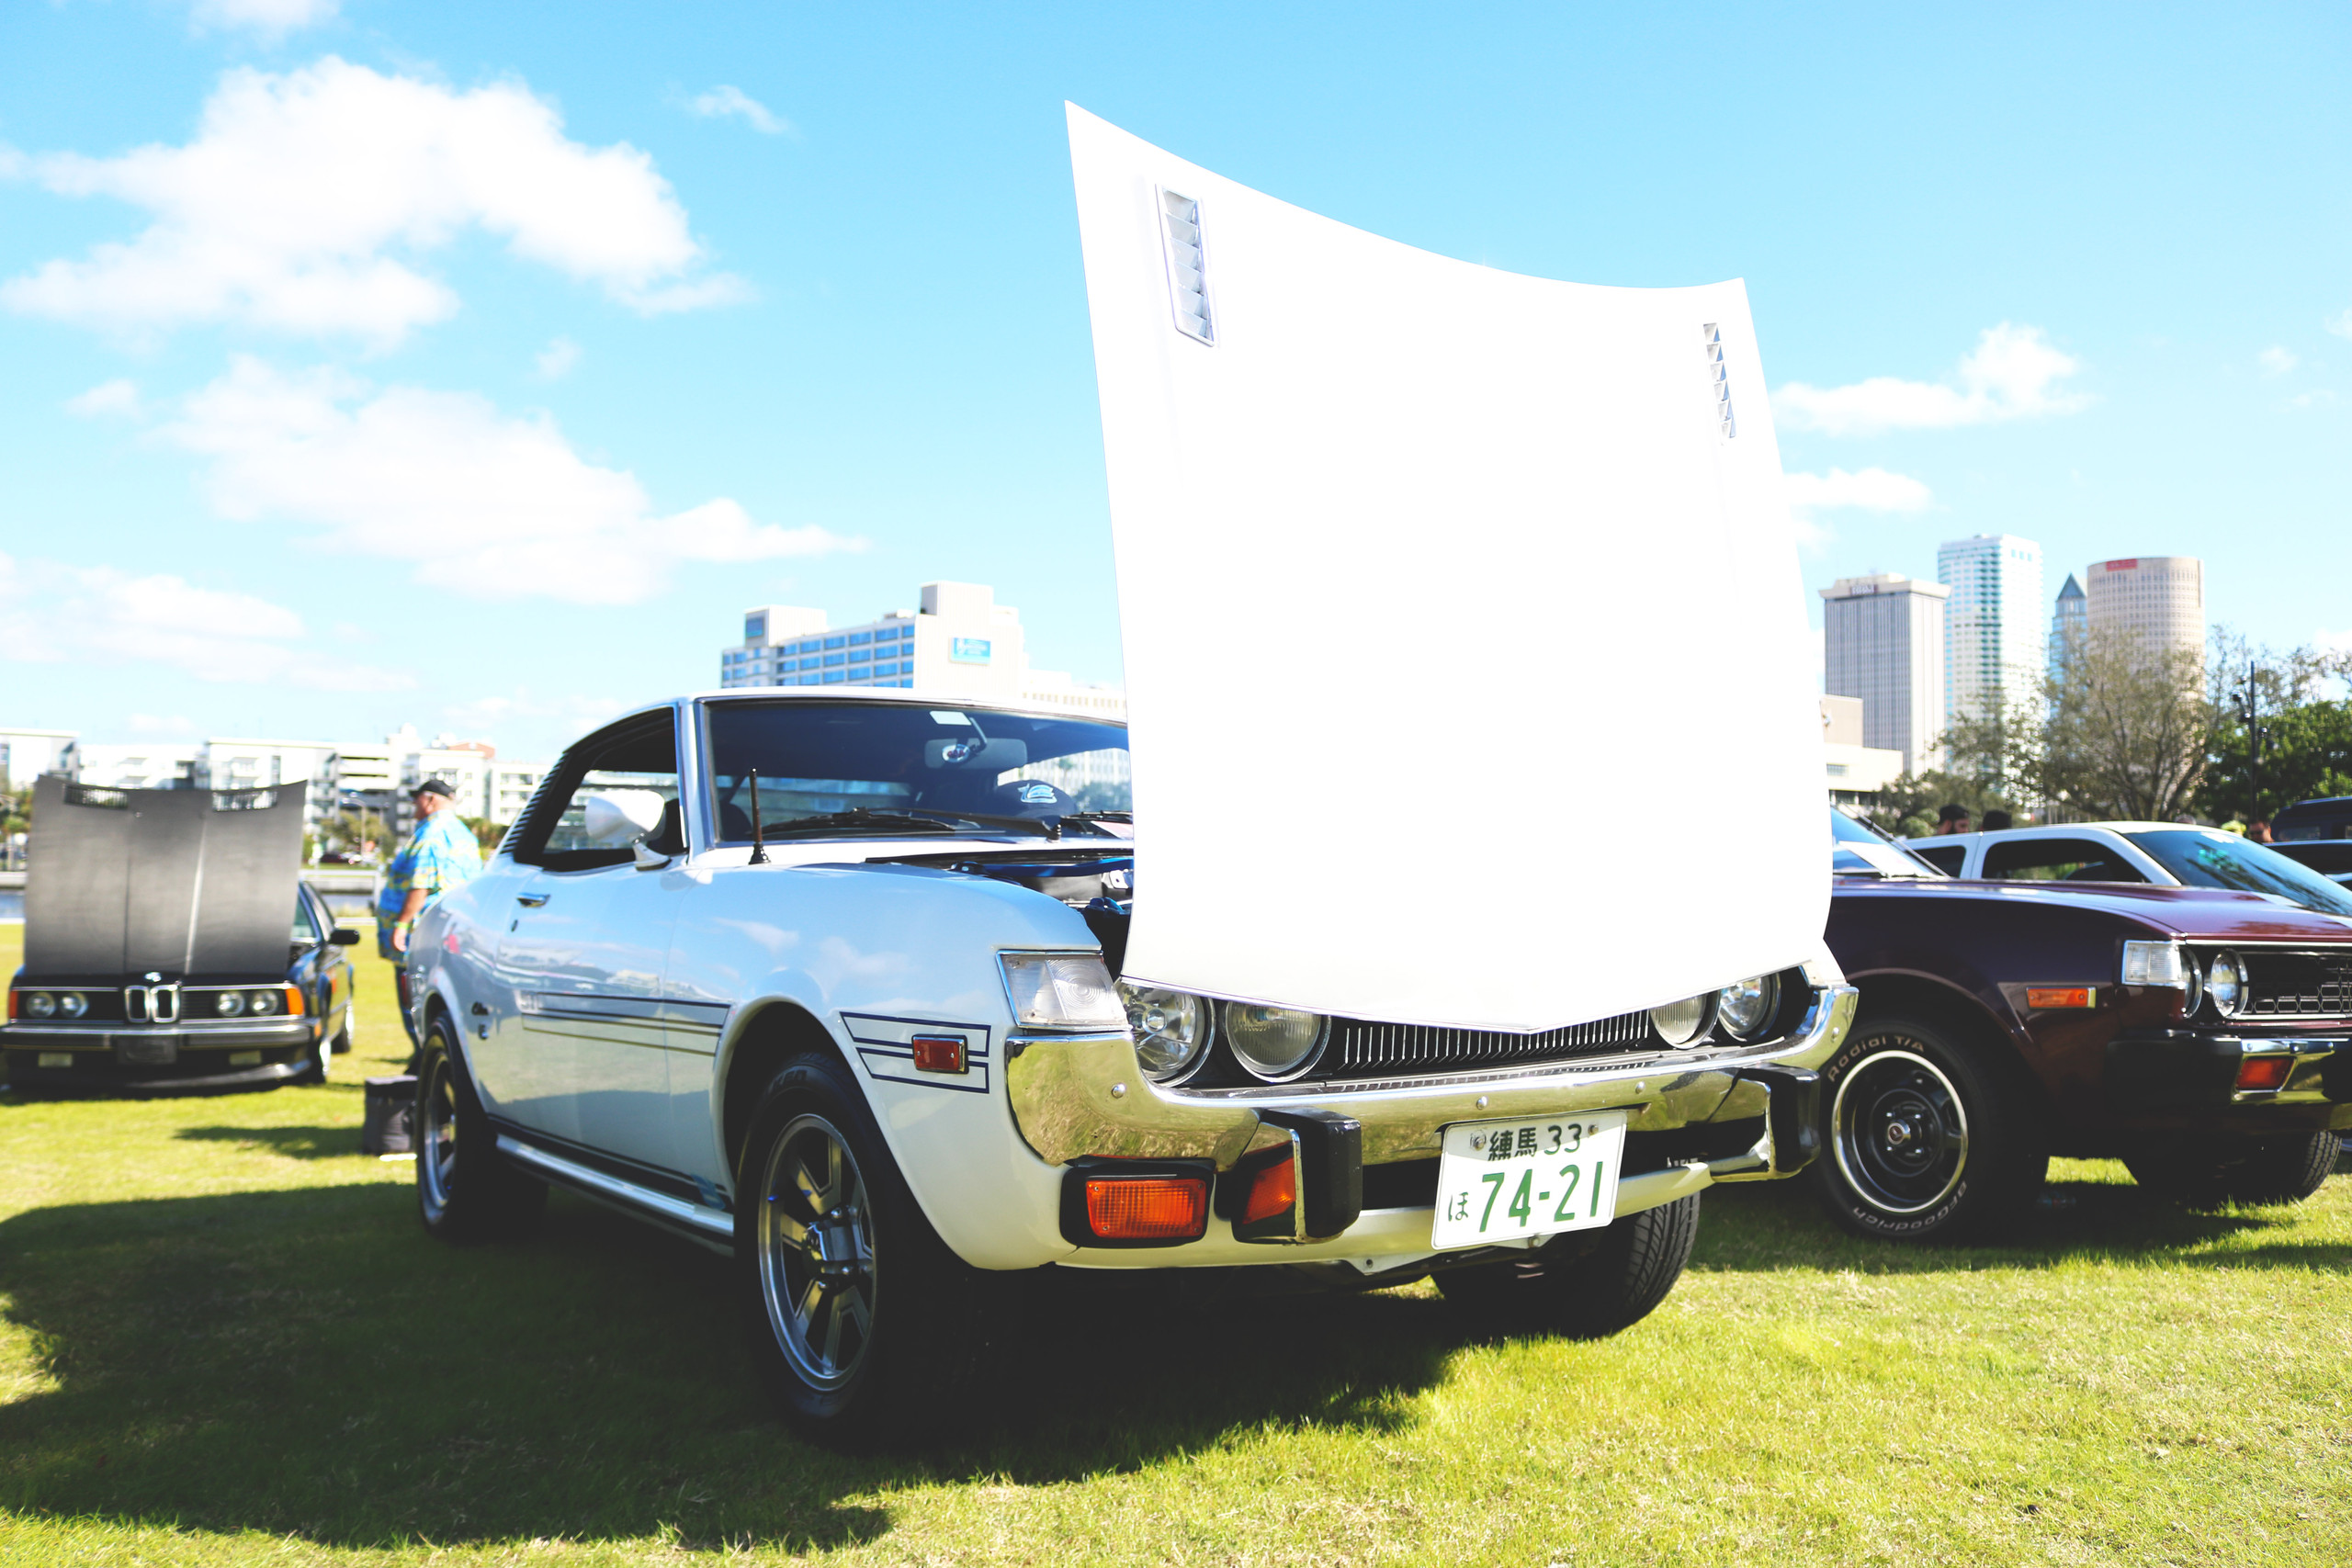 toyota,classic,celica,st,18r,jdm,sports car,rare